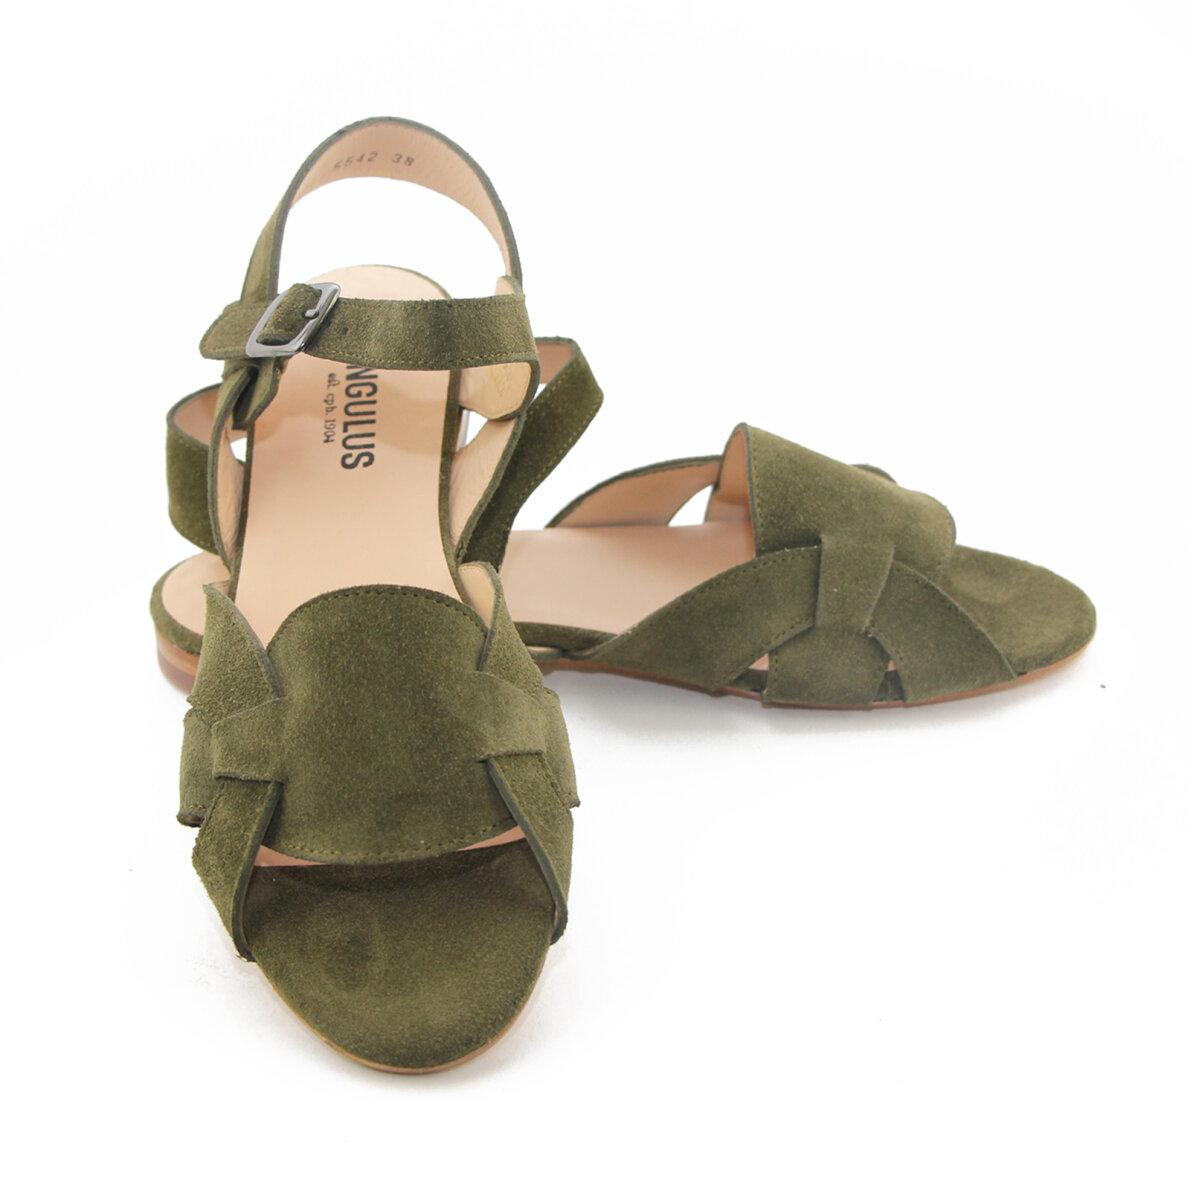 2b401da9f9d4 Angulus 5542 oliven grøn dame sandal med fletdetalje - Piedi.dk